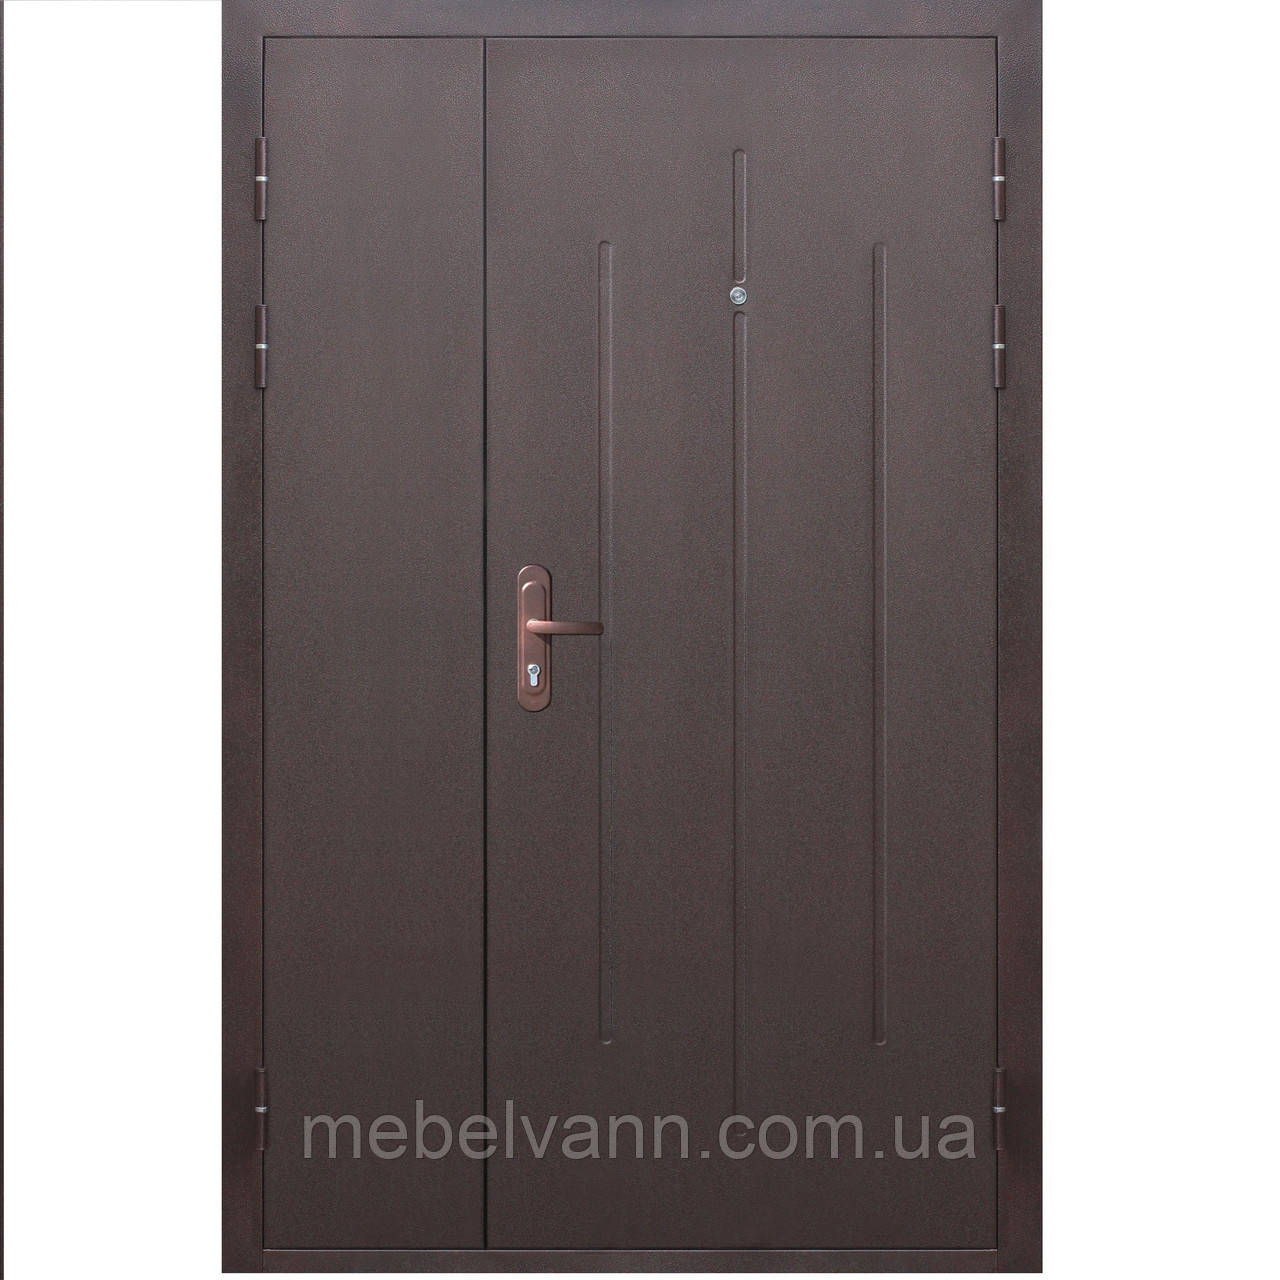 Входная дверь СтройГост 7-1 металл/металл 1200х2050